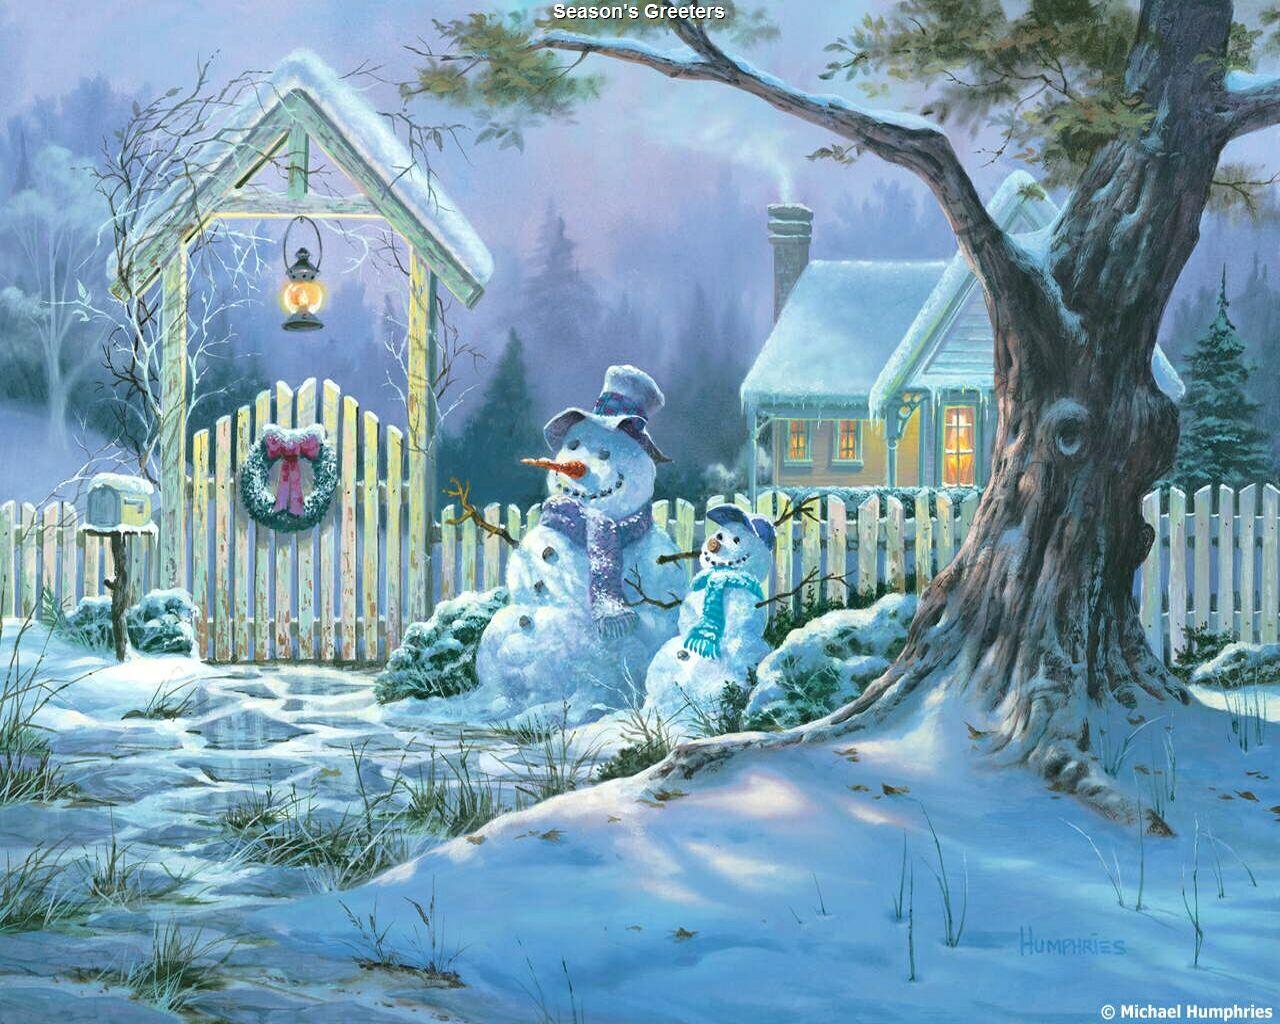 http://ayay.co.uk/backgrounds/christmas/scenes/Seasons-Greeters.jpg